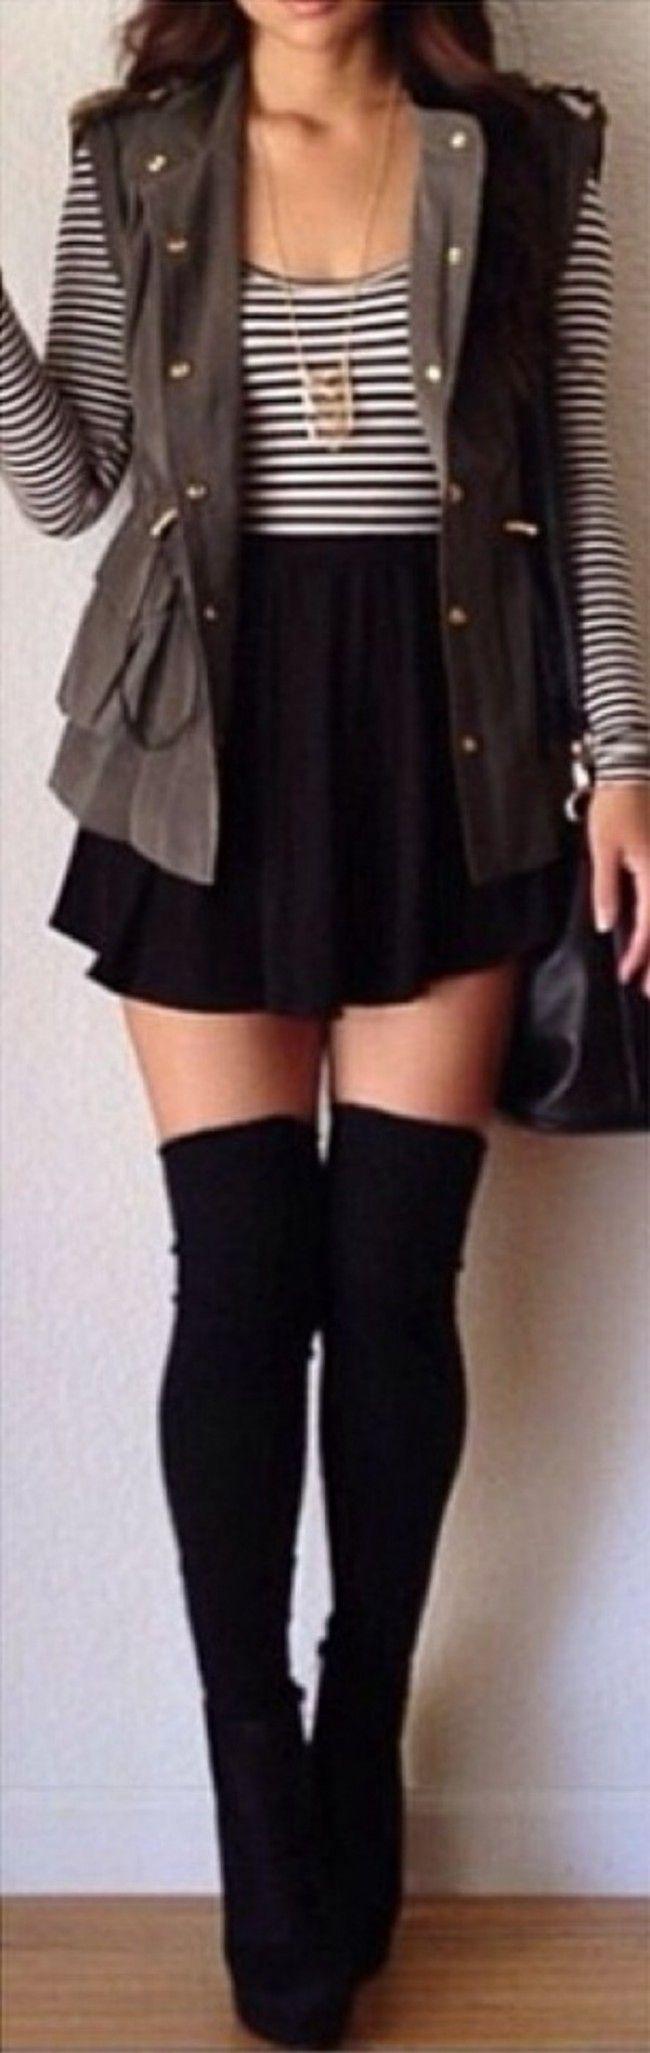 1000 ideas about black skater skirts on pinterest black